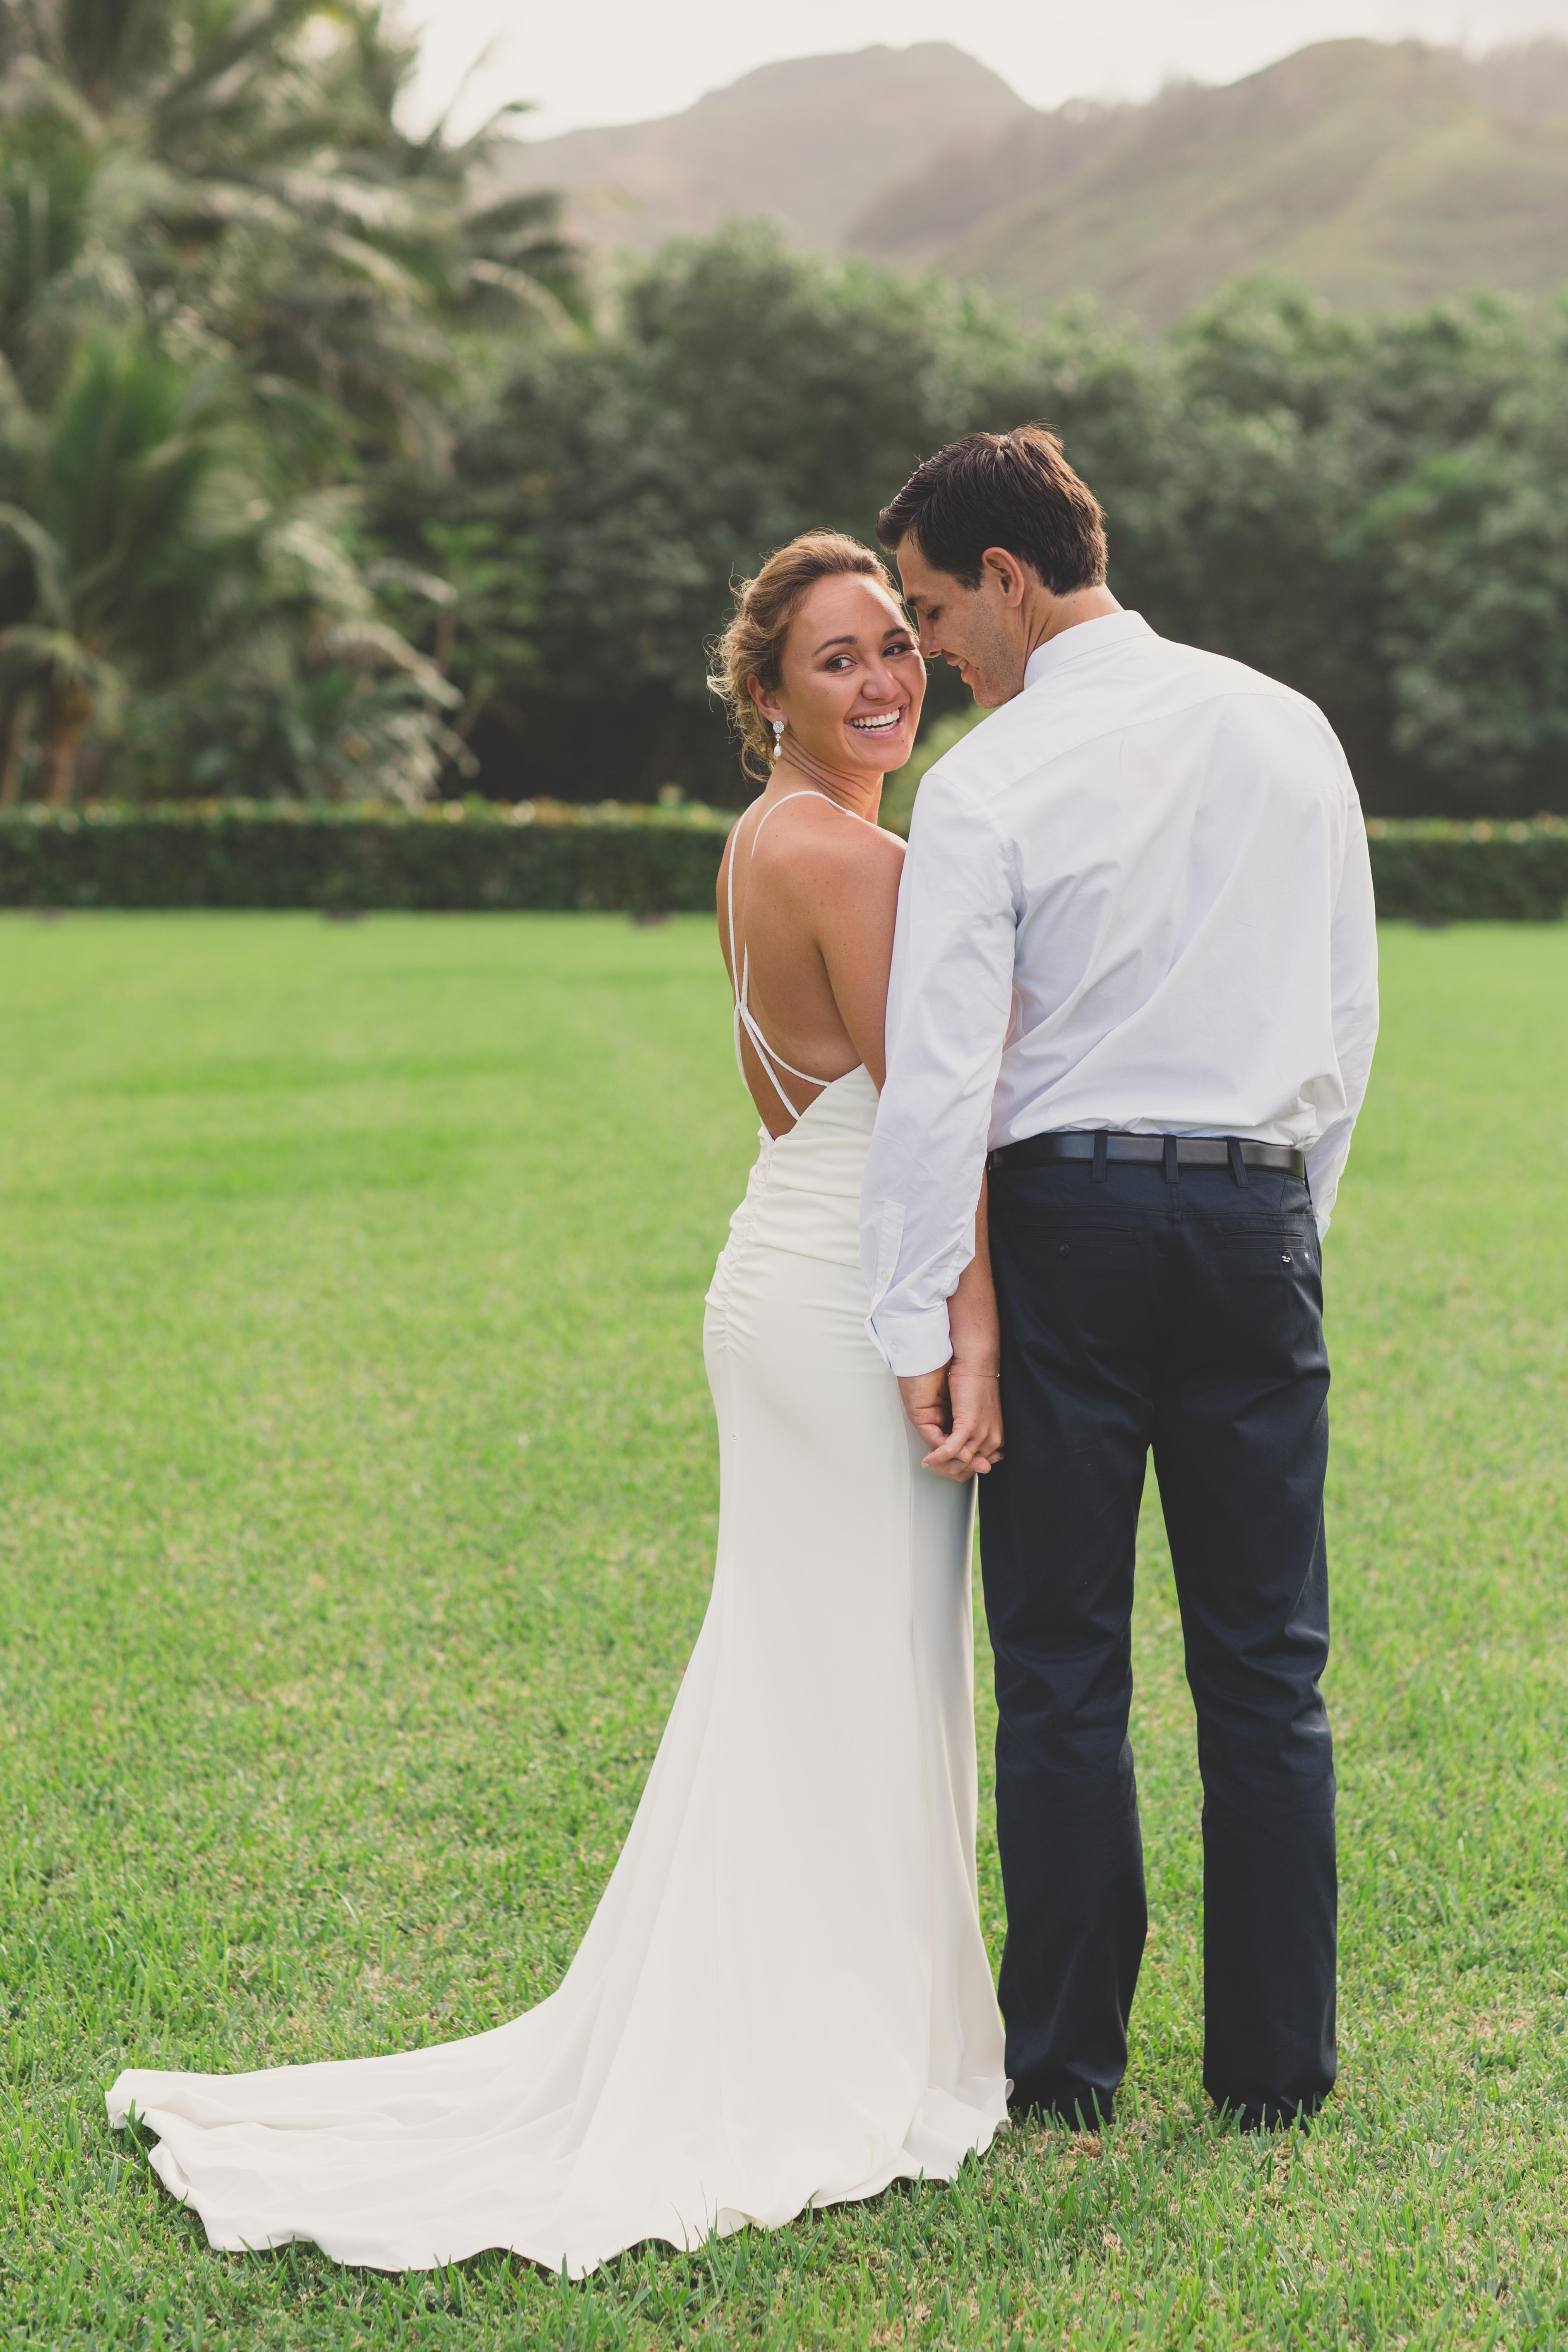 Carissa Moore Reveals Her Backyard Oahu Wedding Album